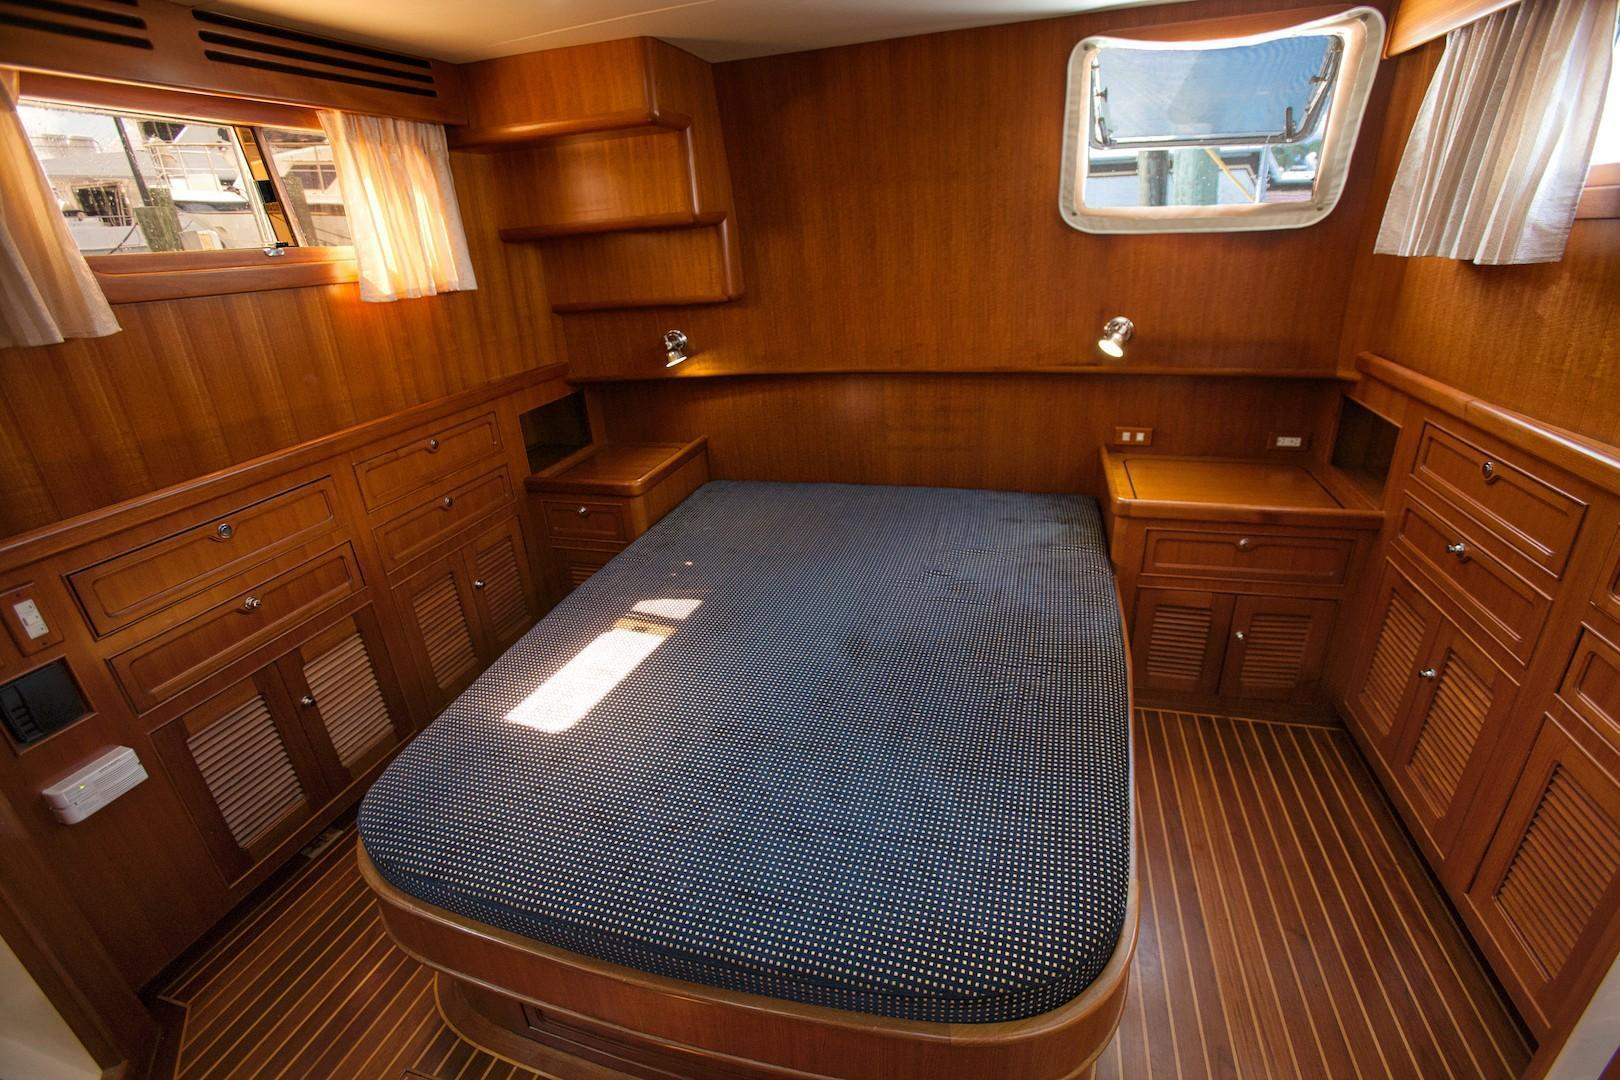 Selene-40 Ocean Trawler 2005 -Pensacola-Florida-United States-1365803 | Thumbnail